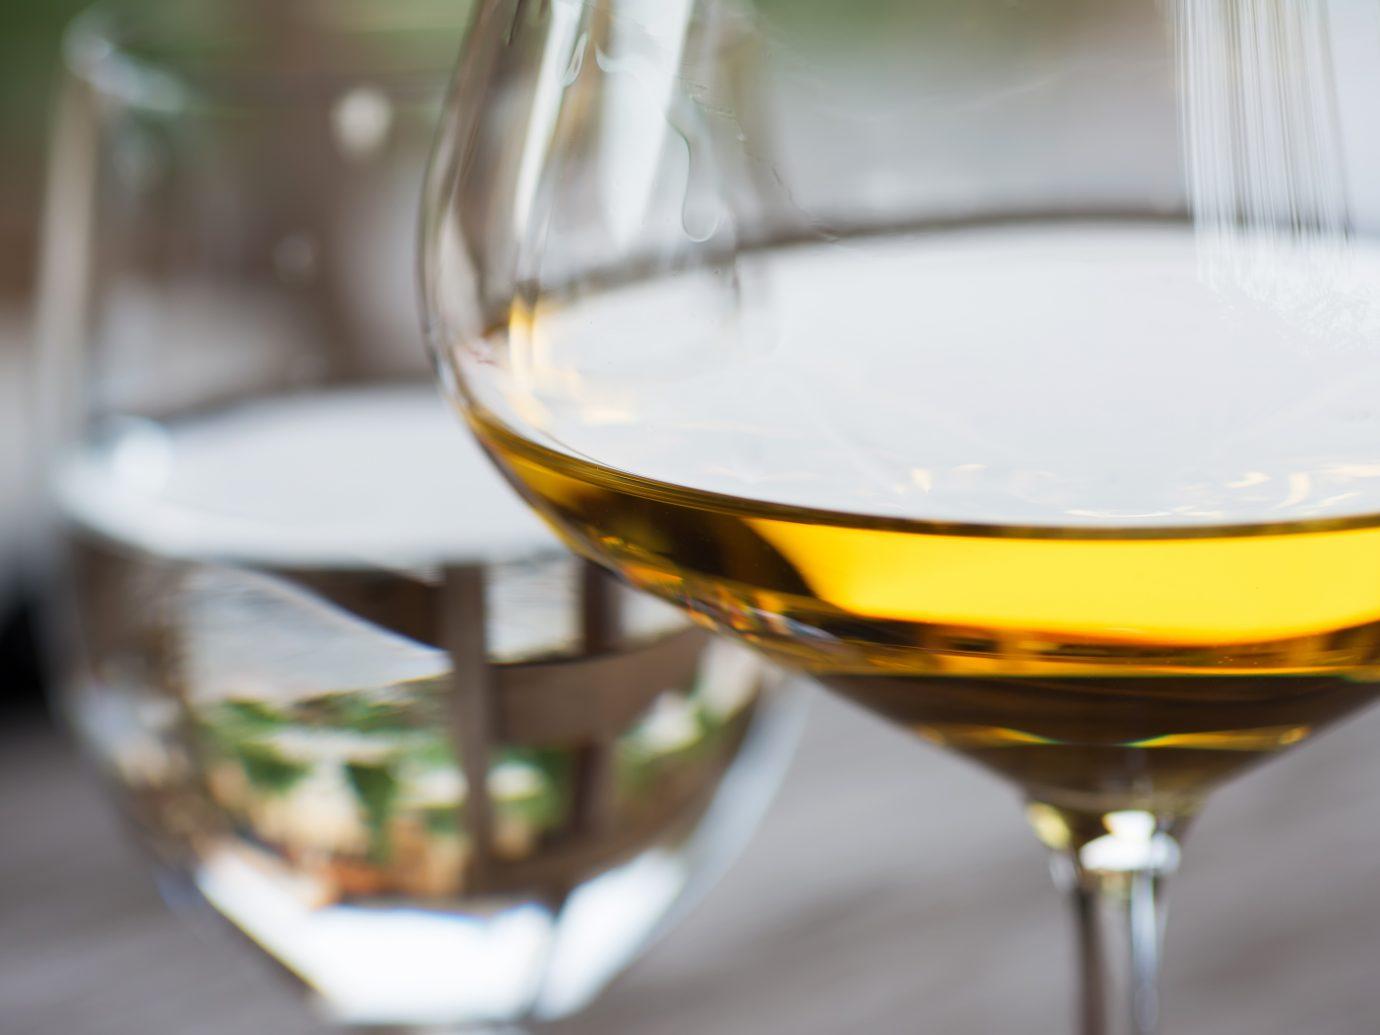 Glass of Chardonnay White Wine Close UpGlass of Chardonnay White Wine Close Up